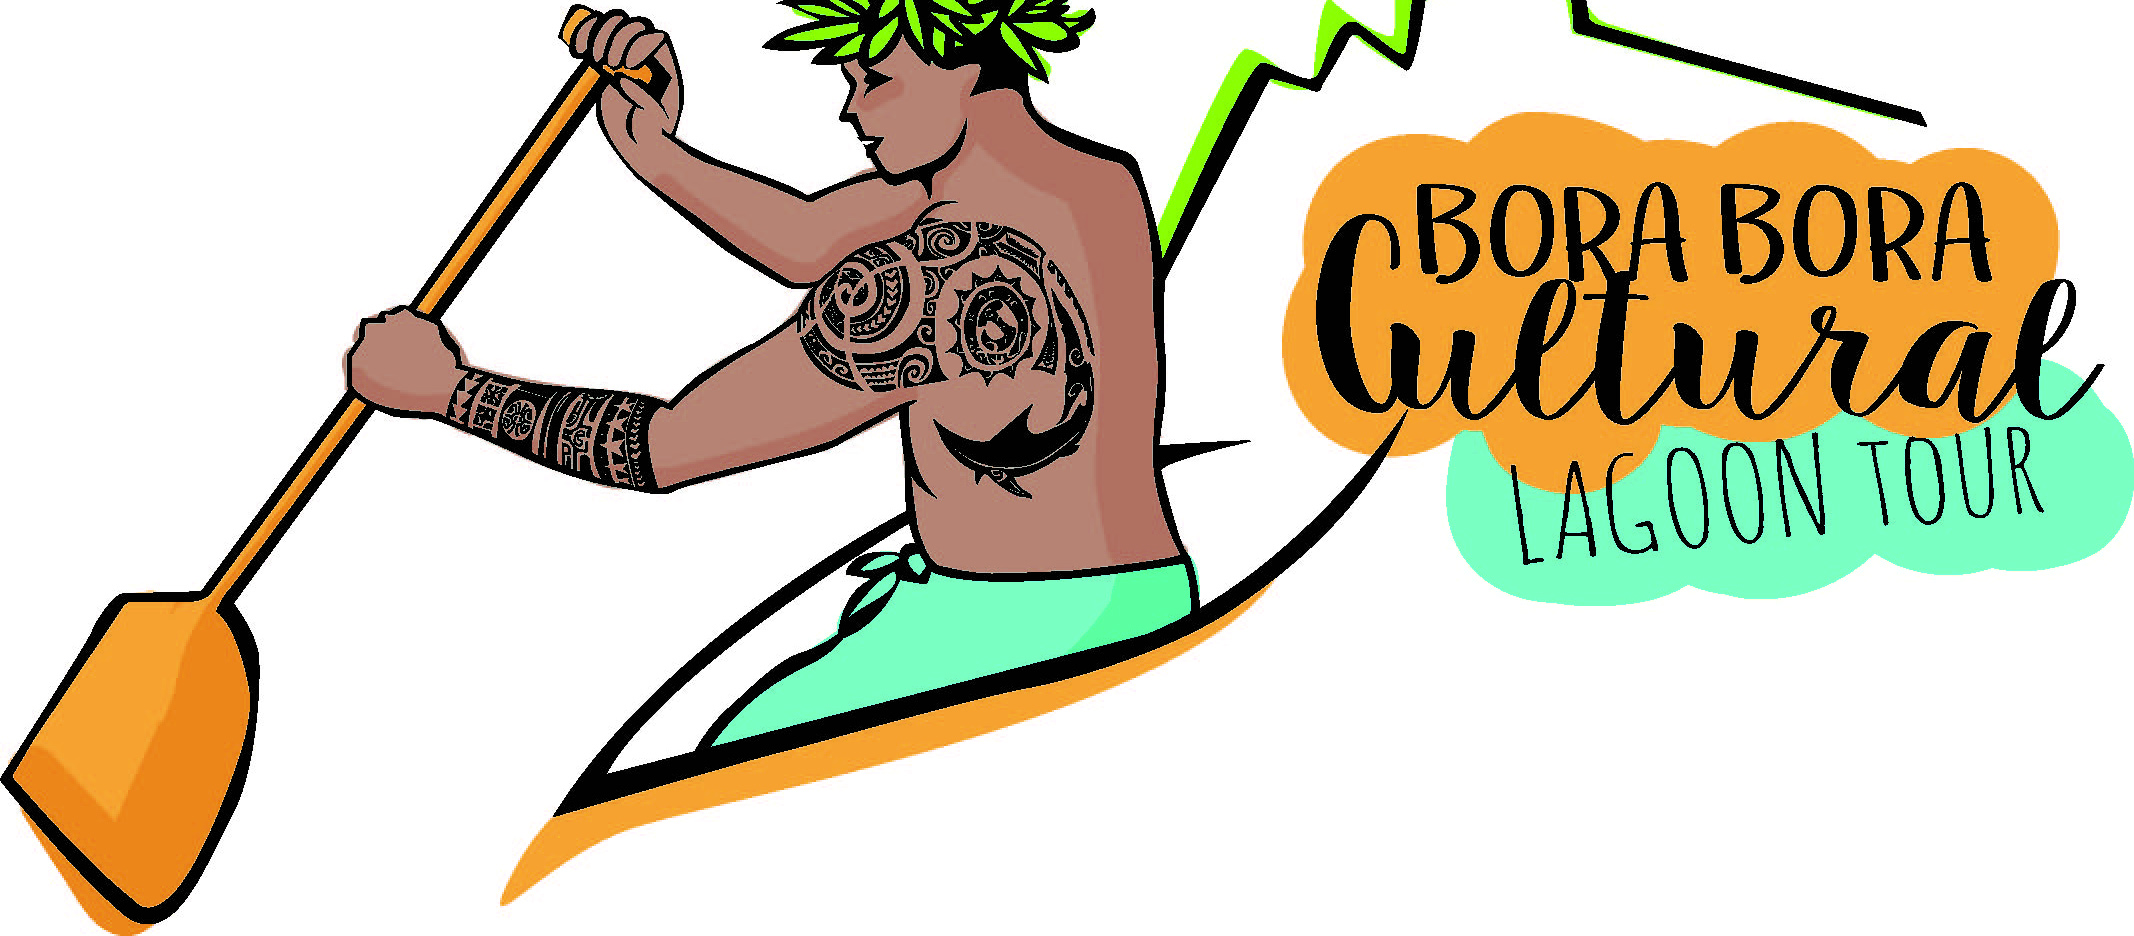 https://tahititourisme.com.br/wp-content/uploads/2018/12/Bob-cultural-lagoon-tour.jpg